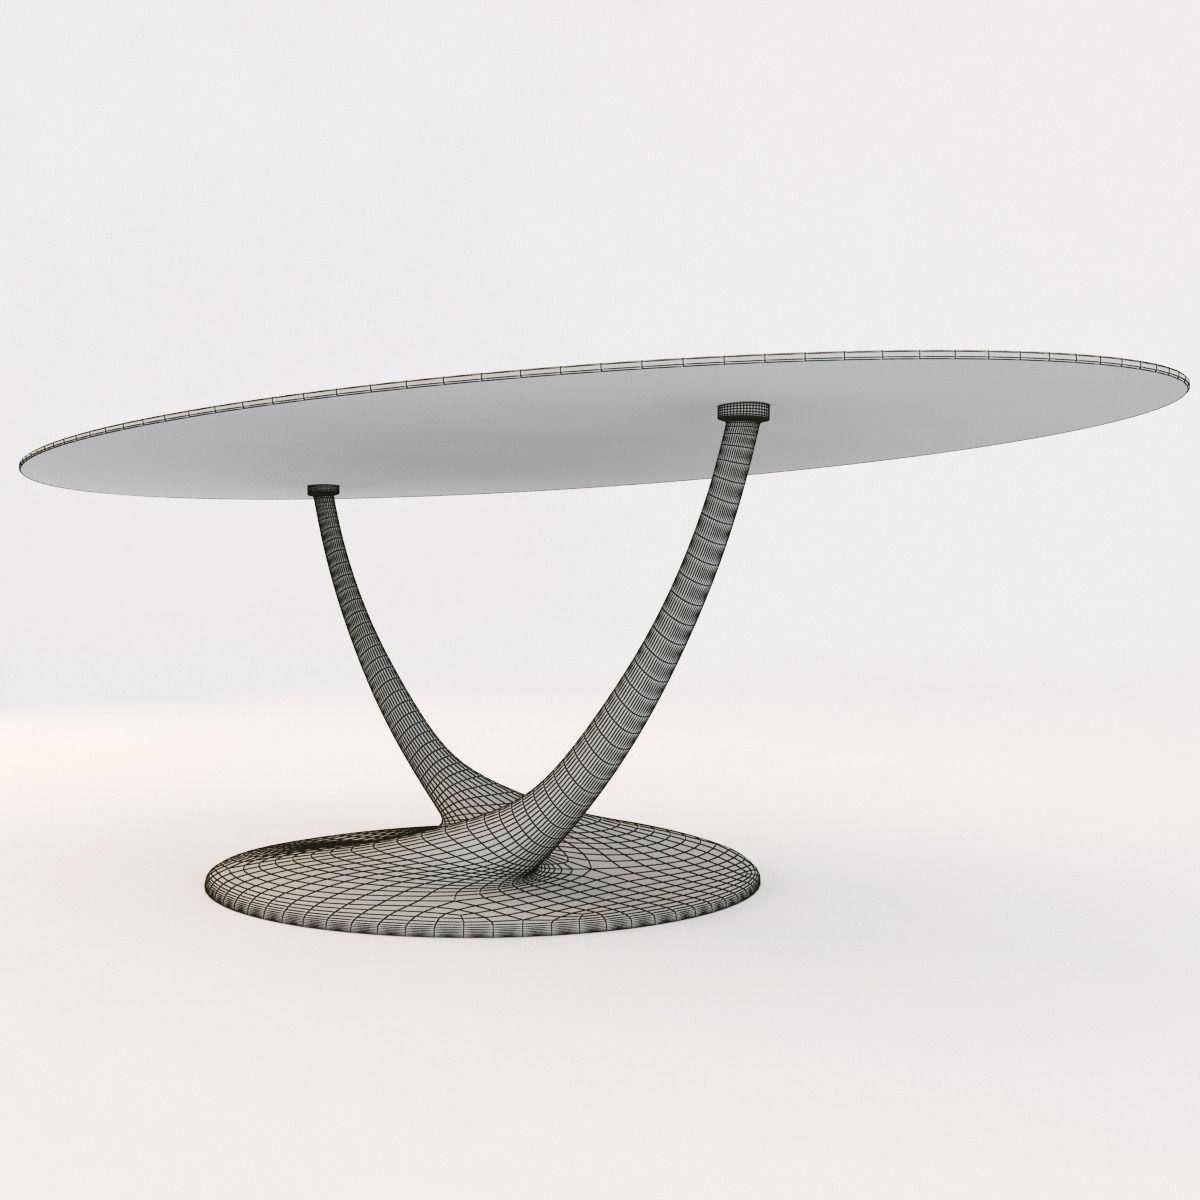 ... Cattelan Italia Coral Table 3d Model Max Obj 3ds Fbx Mtl 3 ...